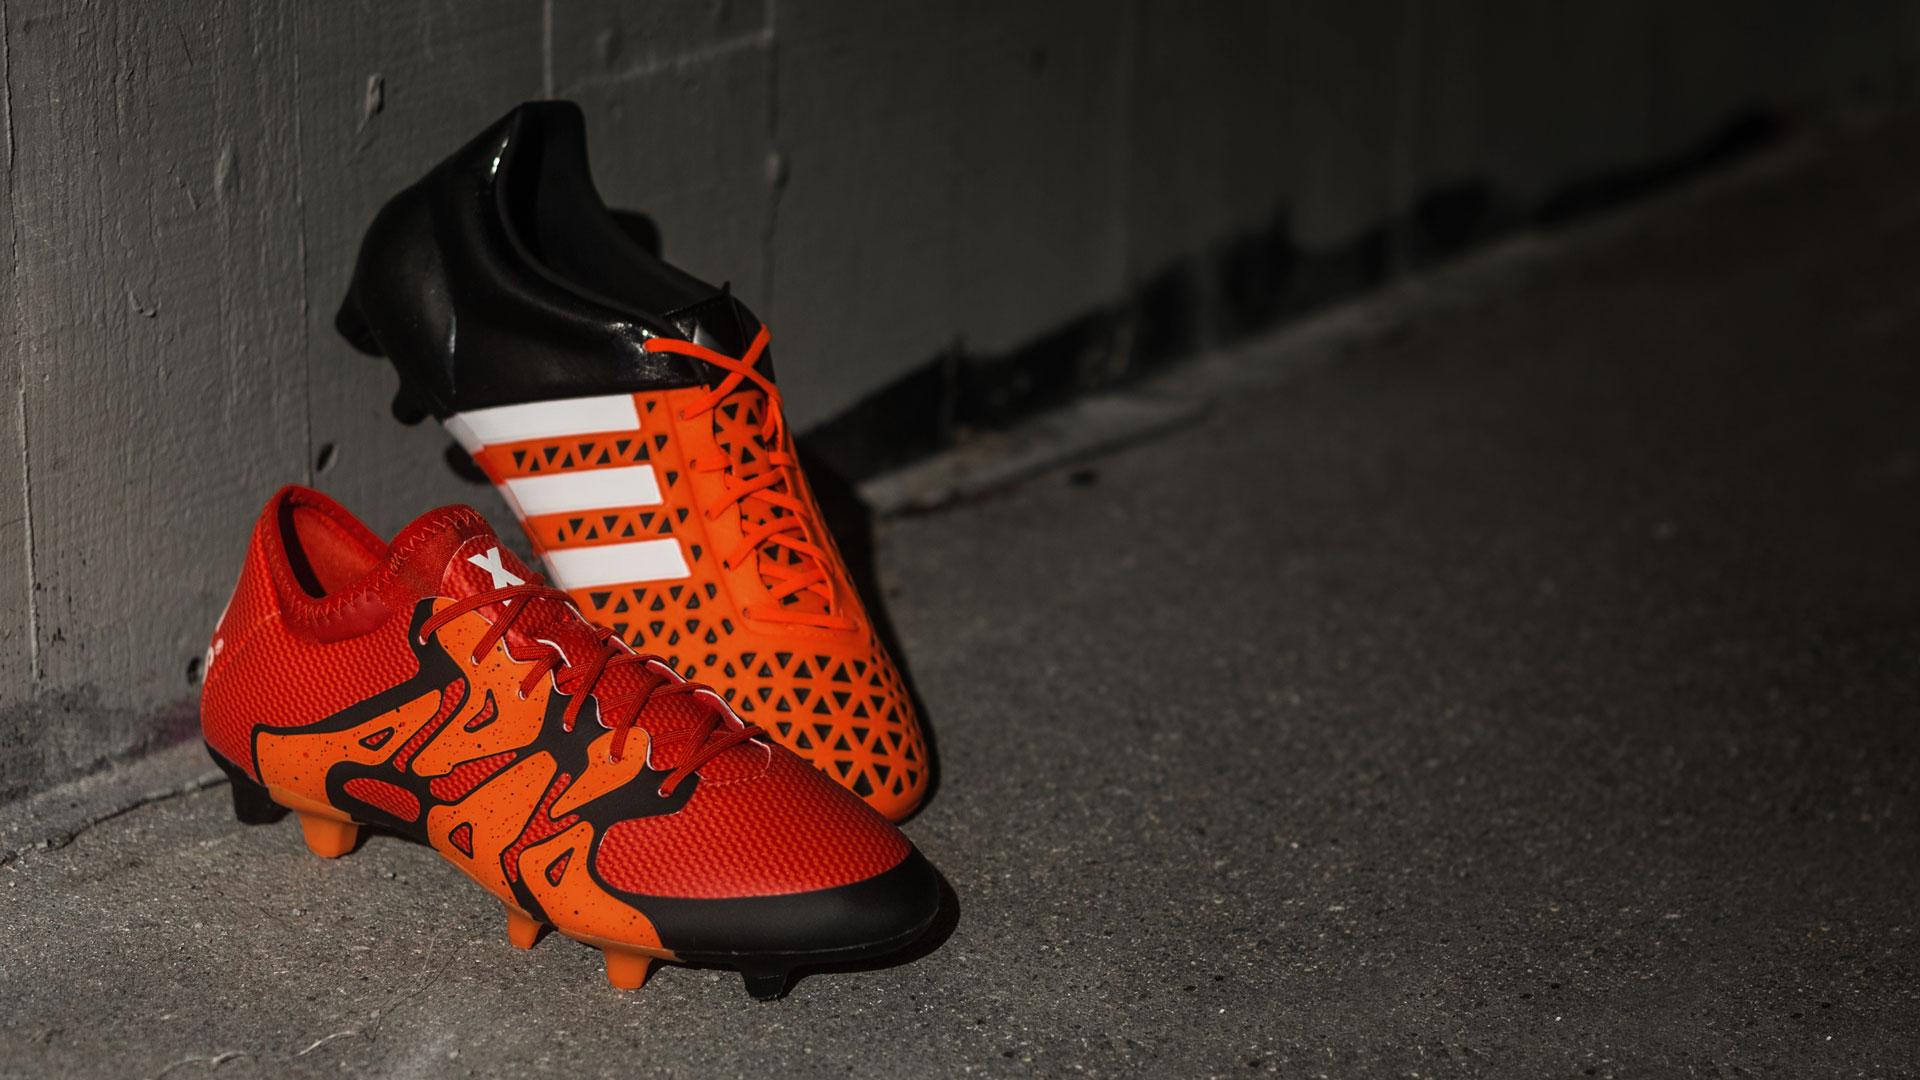 Adidas gir Ace15 og X15 samme 'Solar Orange' design som